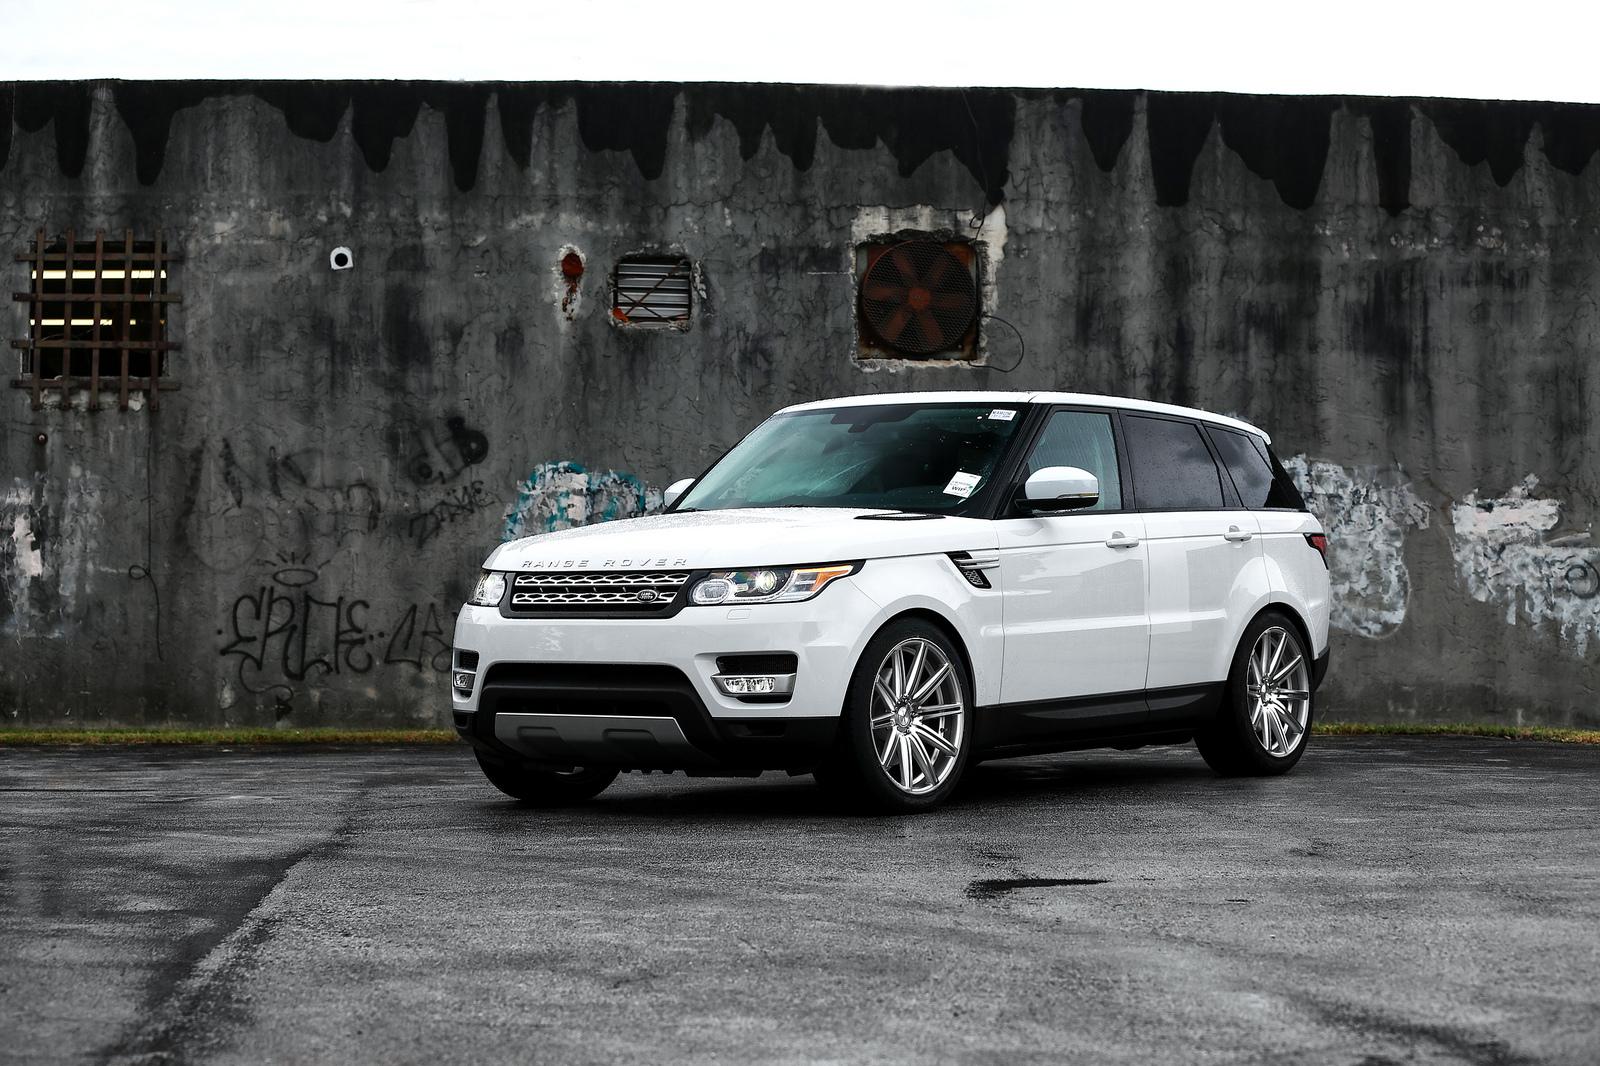 2014 range rover sport gets vossen wheels autoevolution. Black Bedroom Furniture Sets. Home Design Ideas